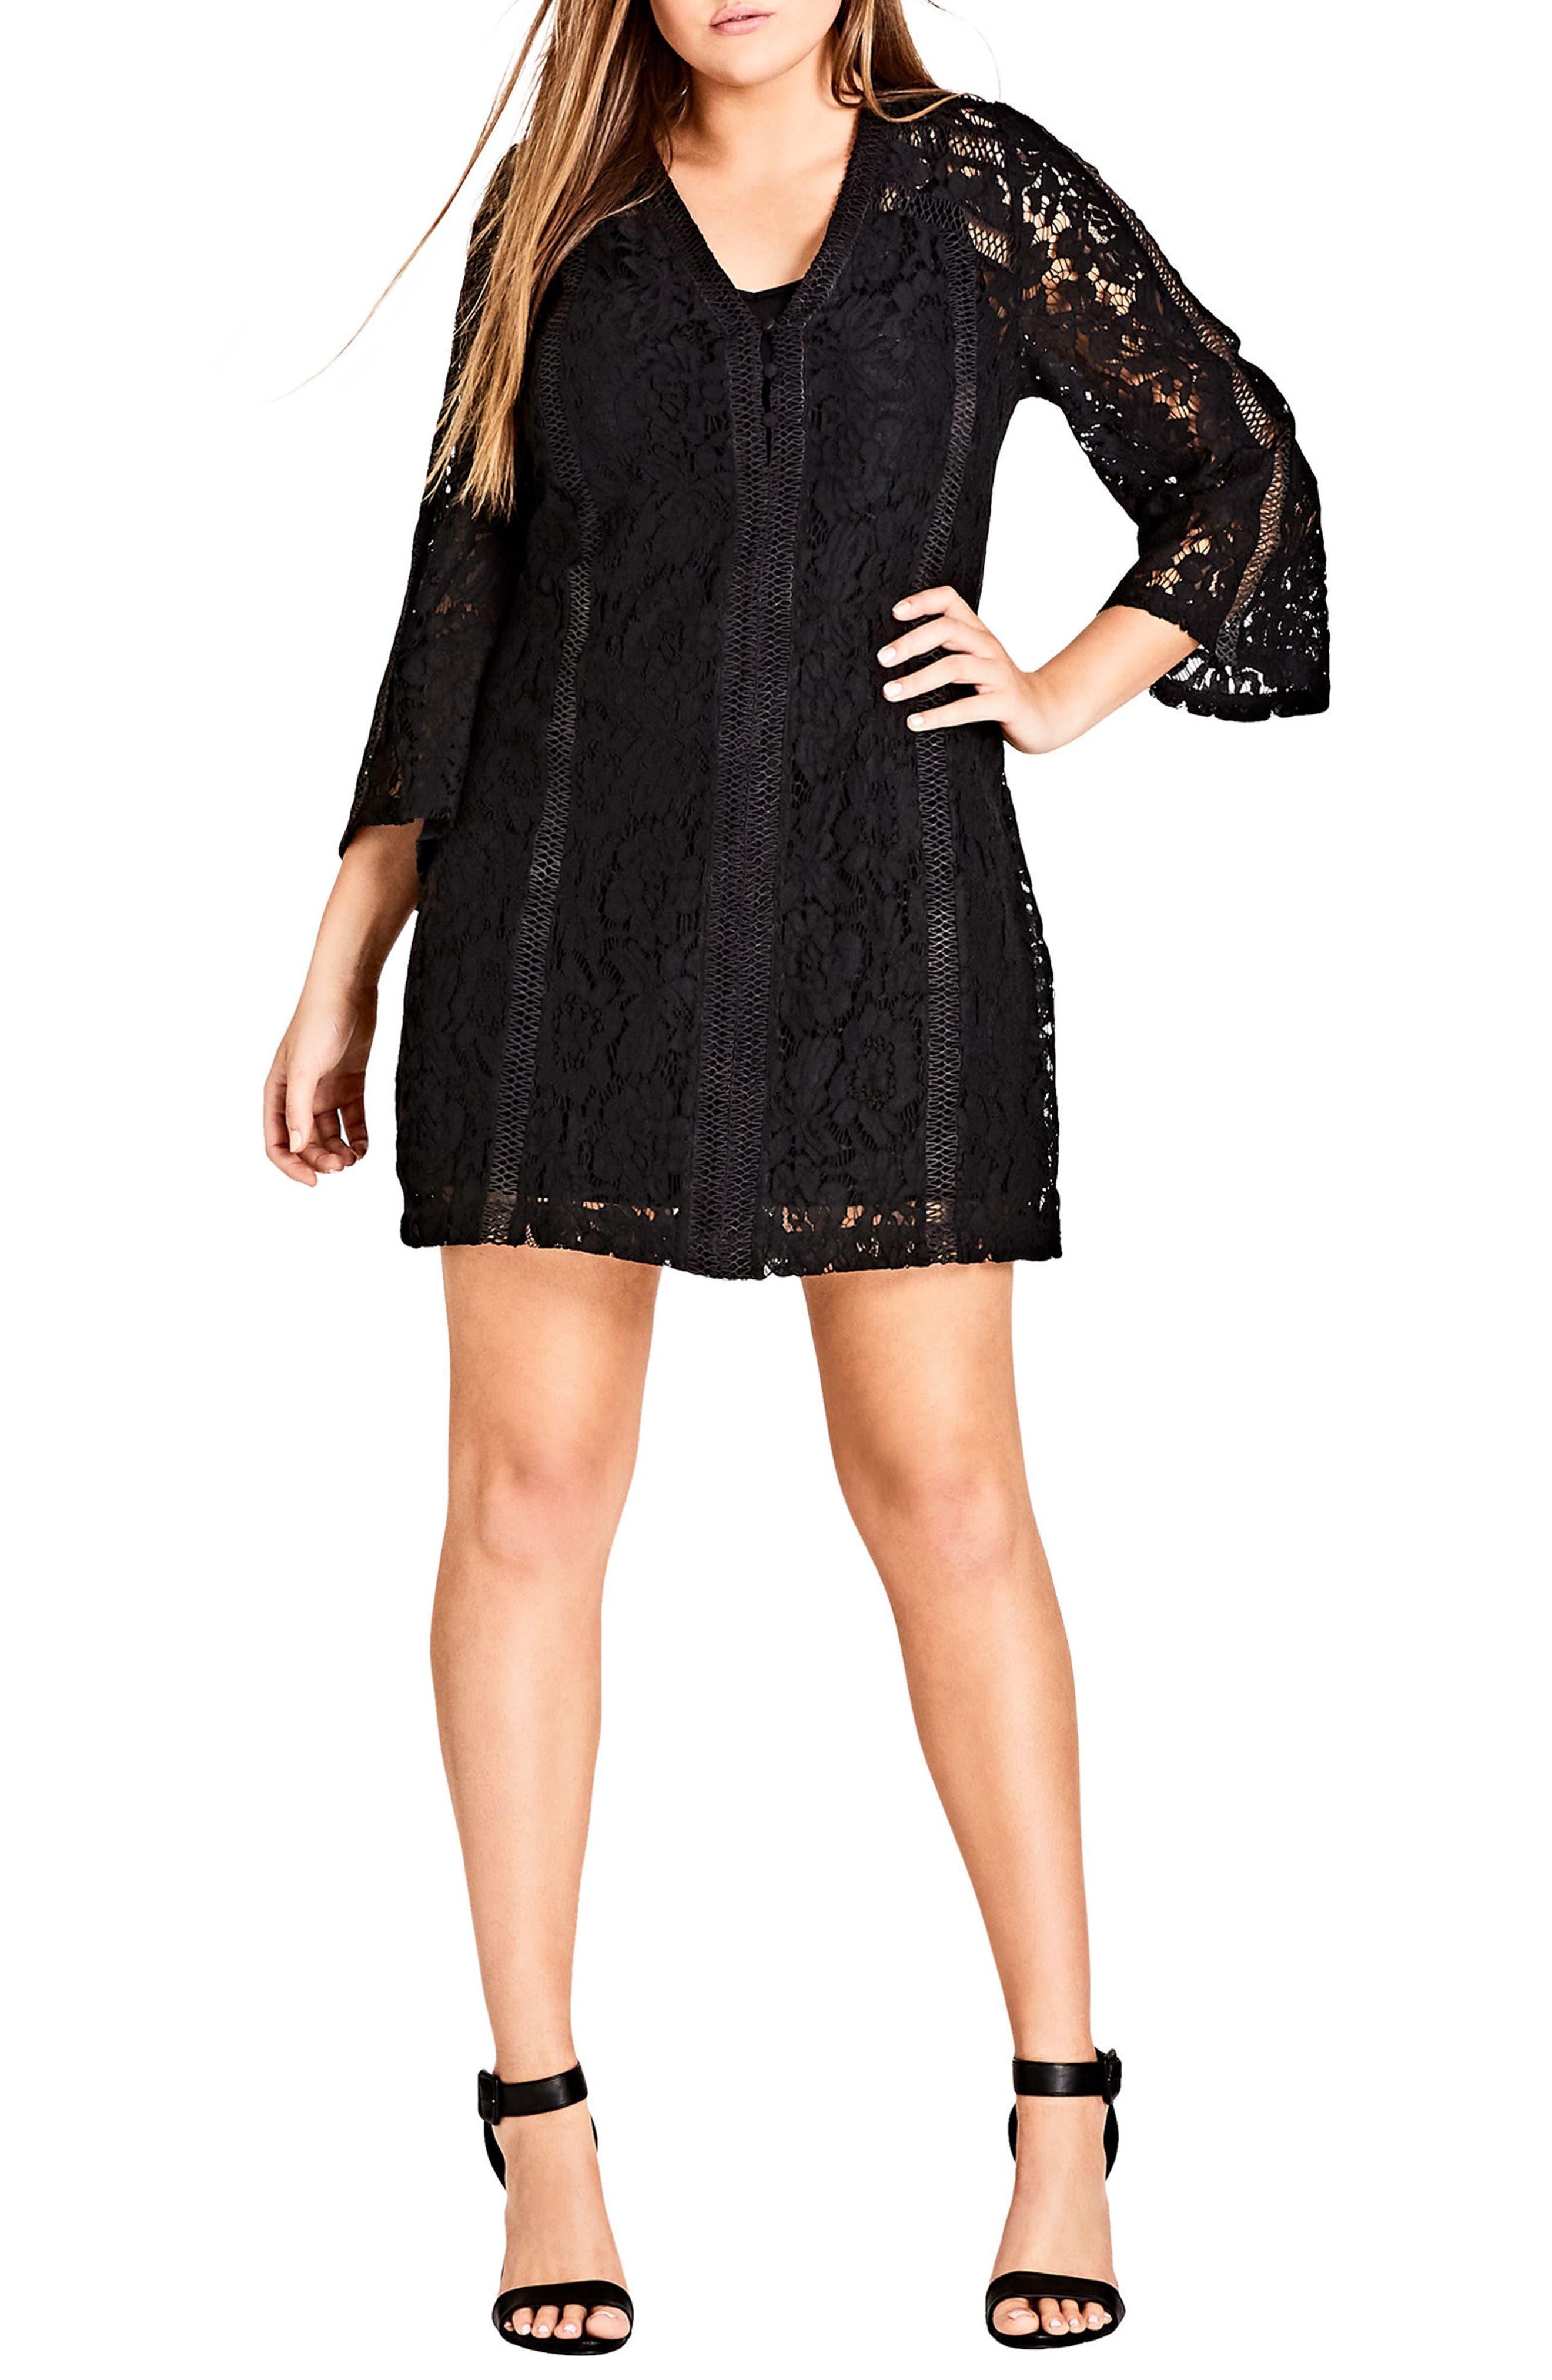 Main Image - City Chic Innocent Lace Shift Dress (Plus Size)